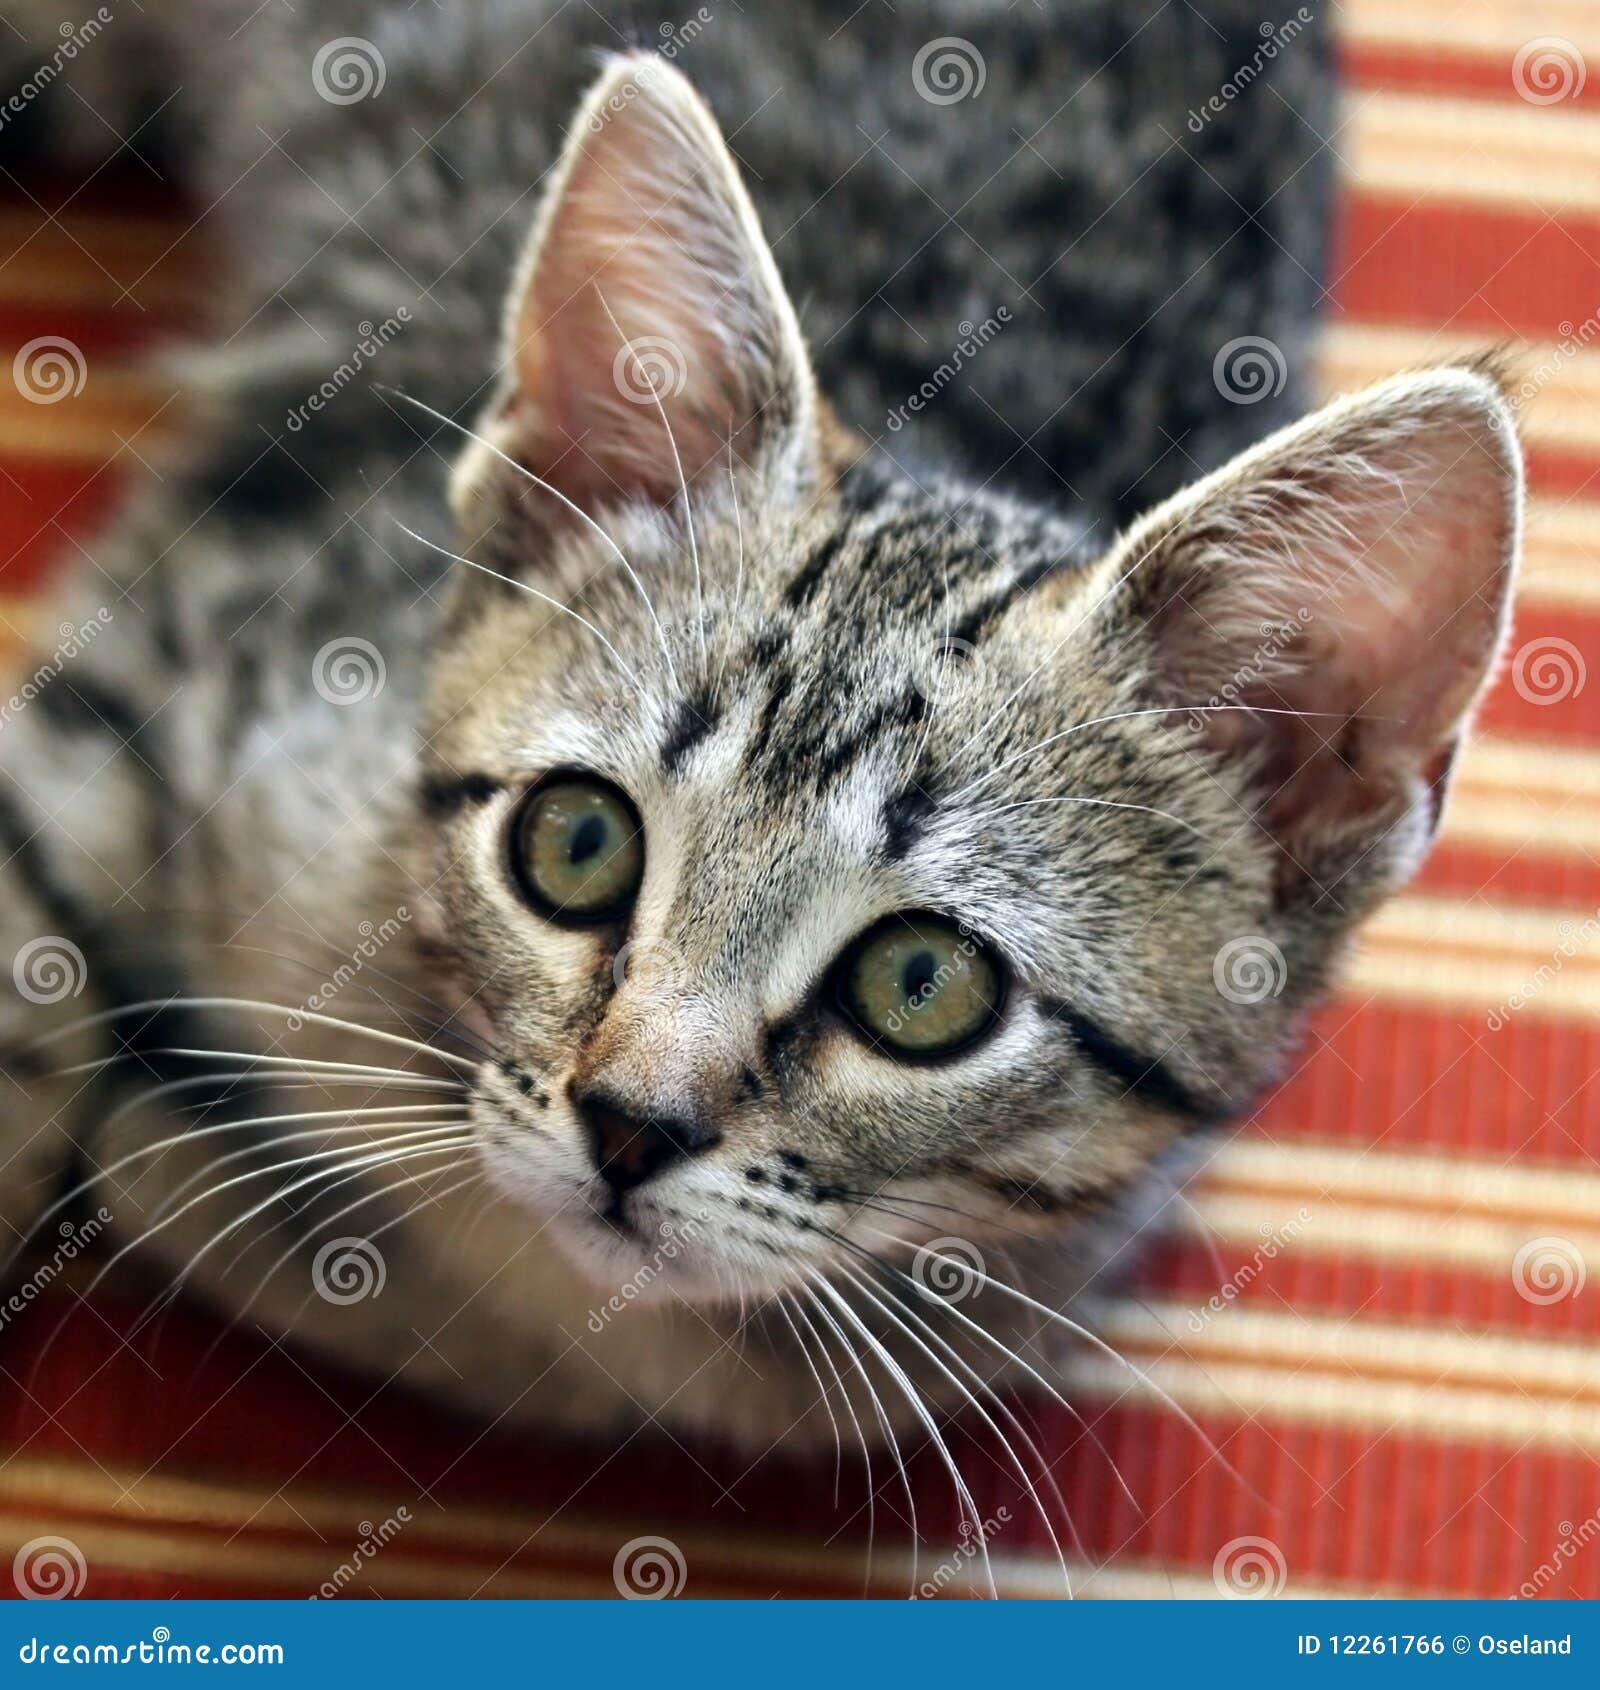 gray tabby kitten on chair stock photo image of kitten 12261766. Black Bedroom Furniture Sets. Home Design Ideas